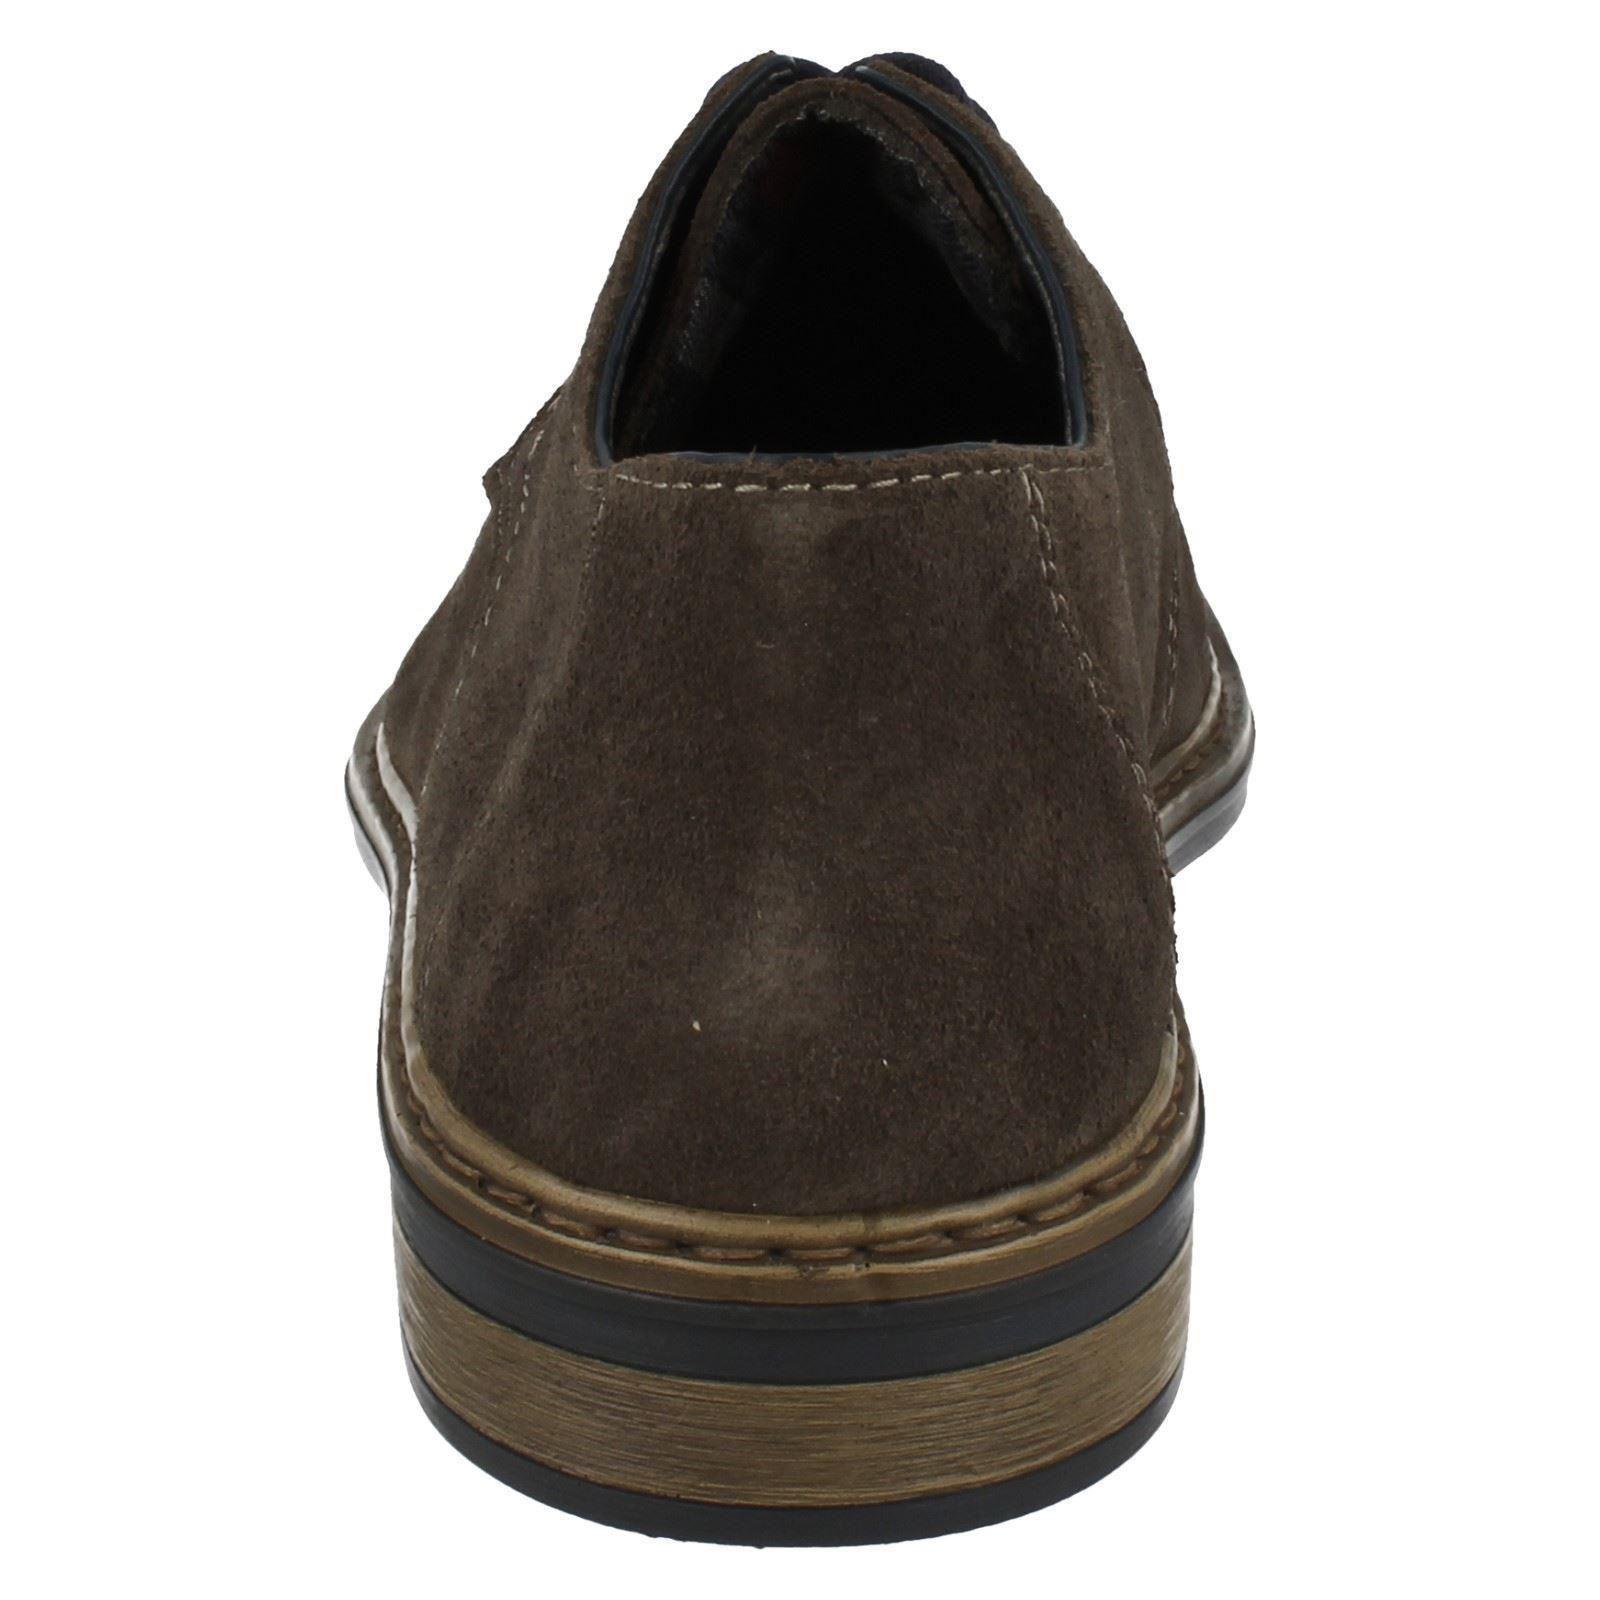 Uomo Rieker Antistress Schuhes Smart Schuhes Antistress 17622 eef911